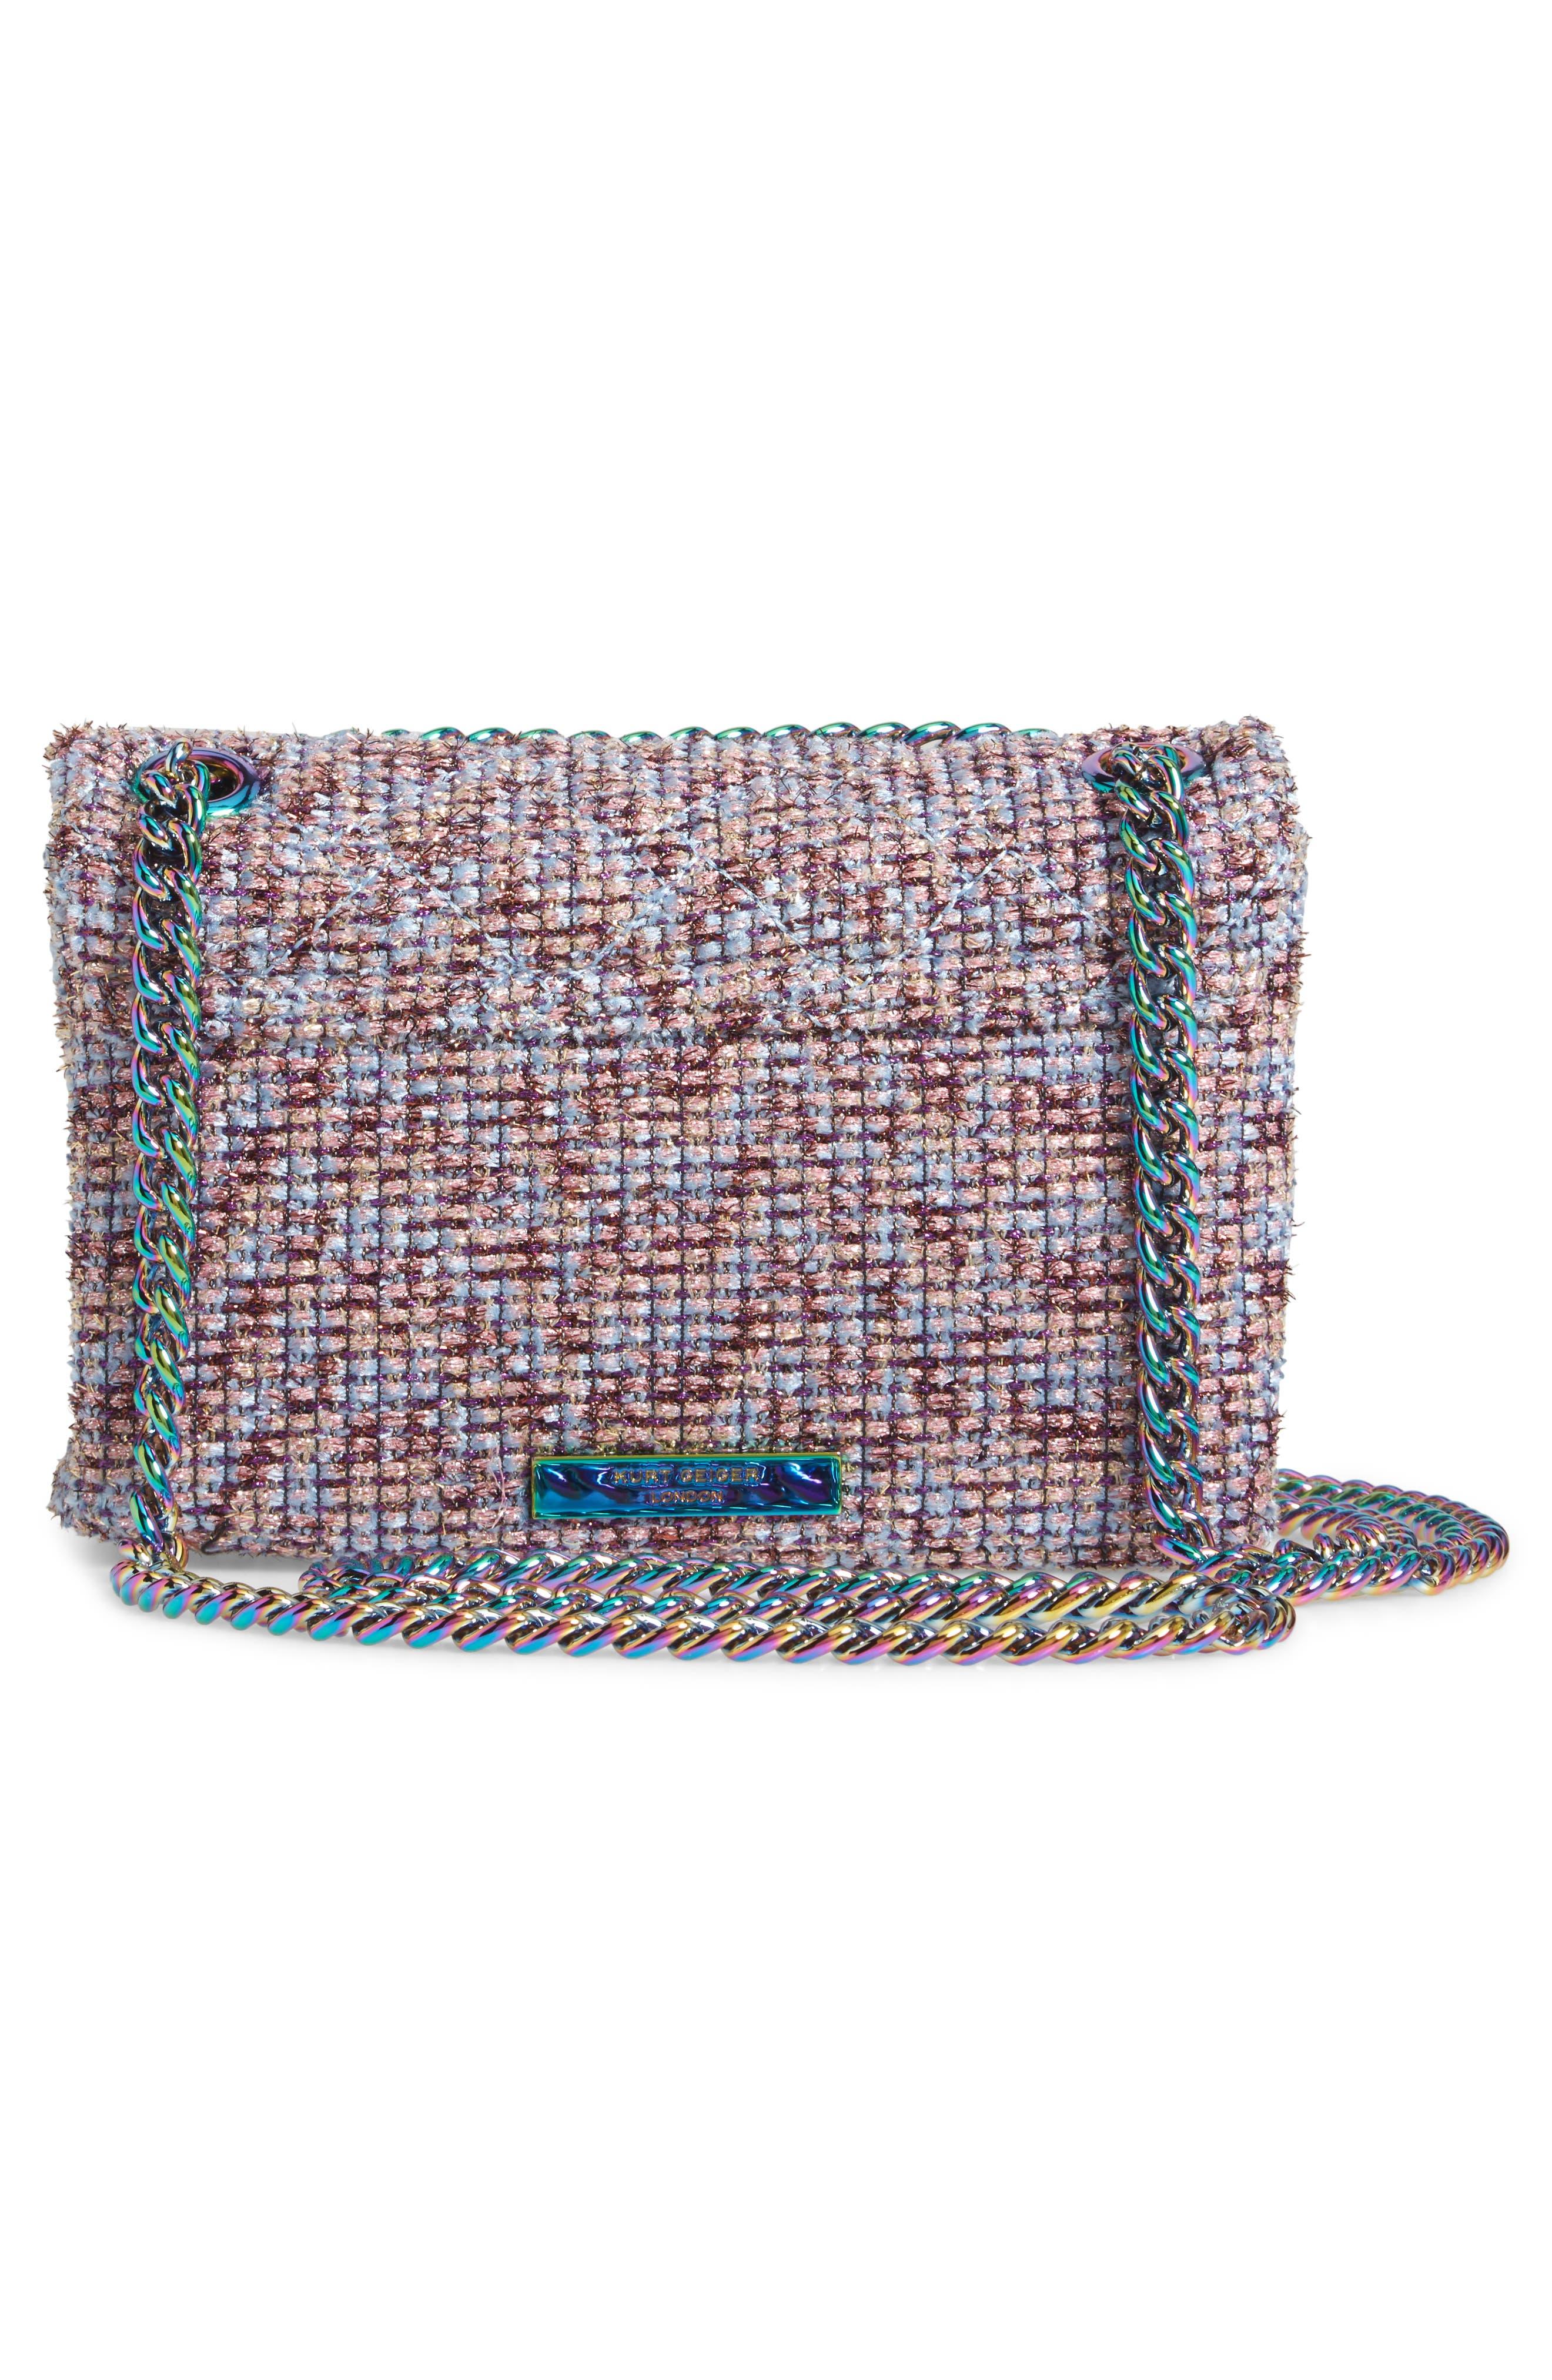 Mini Kensington Tweed Crossbody Bag,                             Alternate thumbnail 3, color,                             PINK